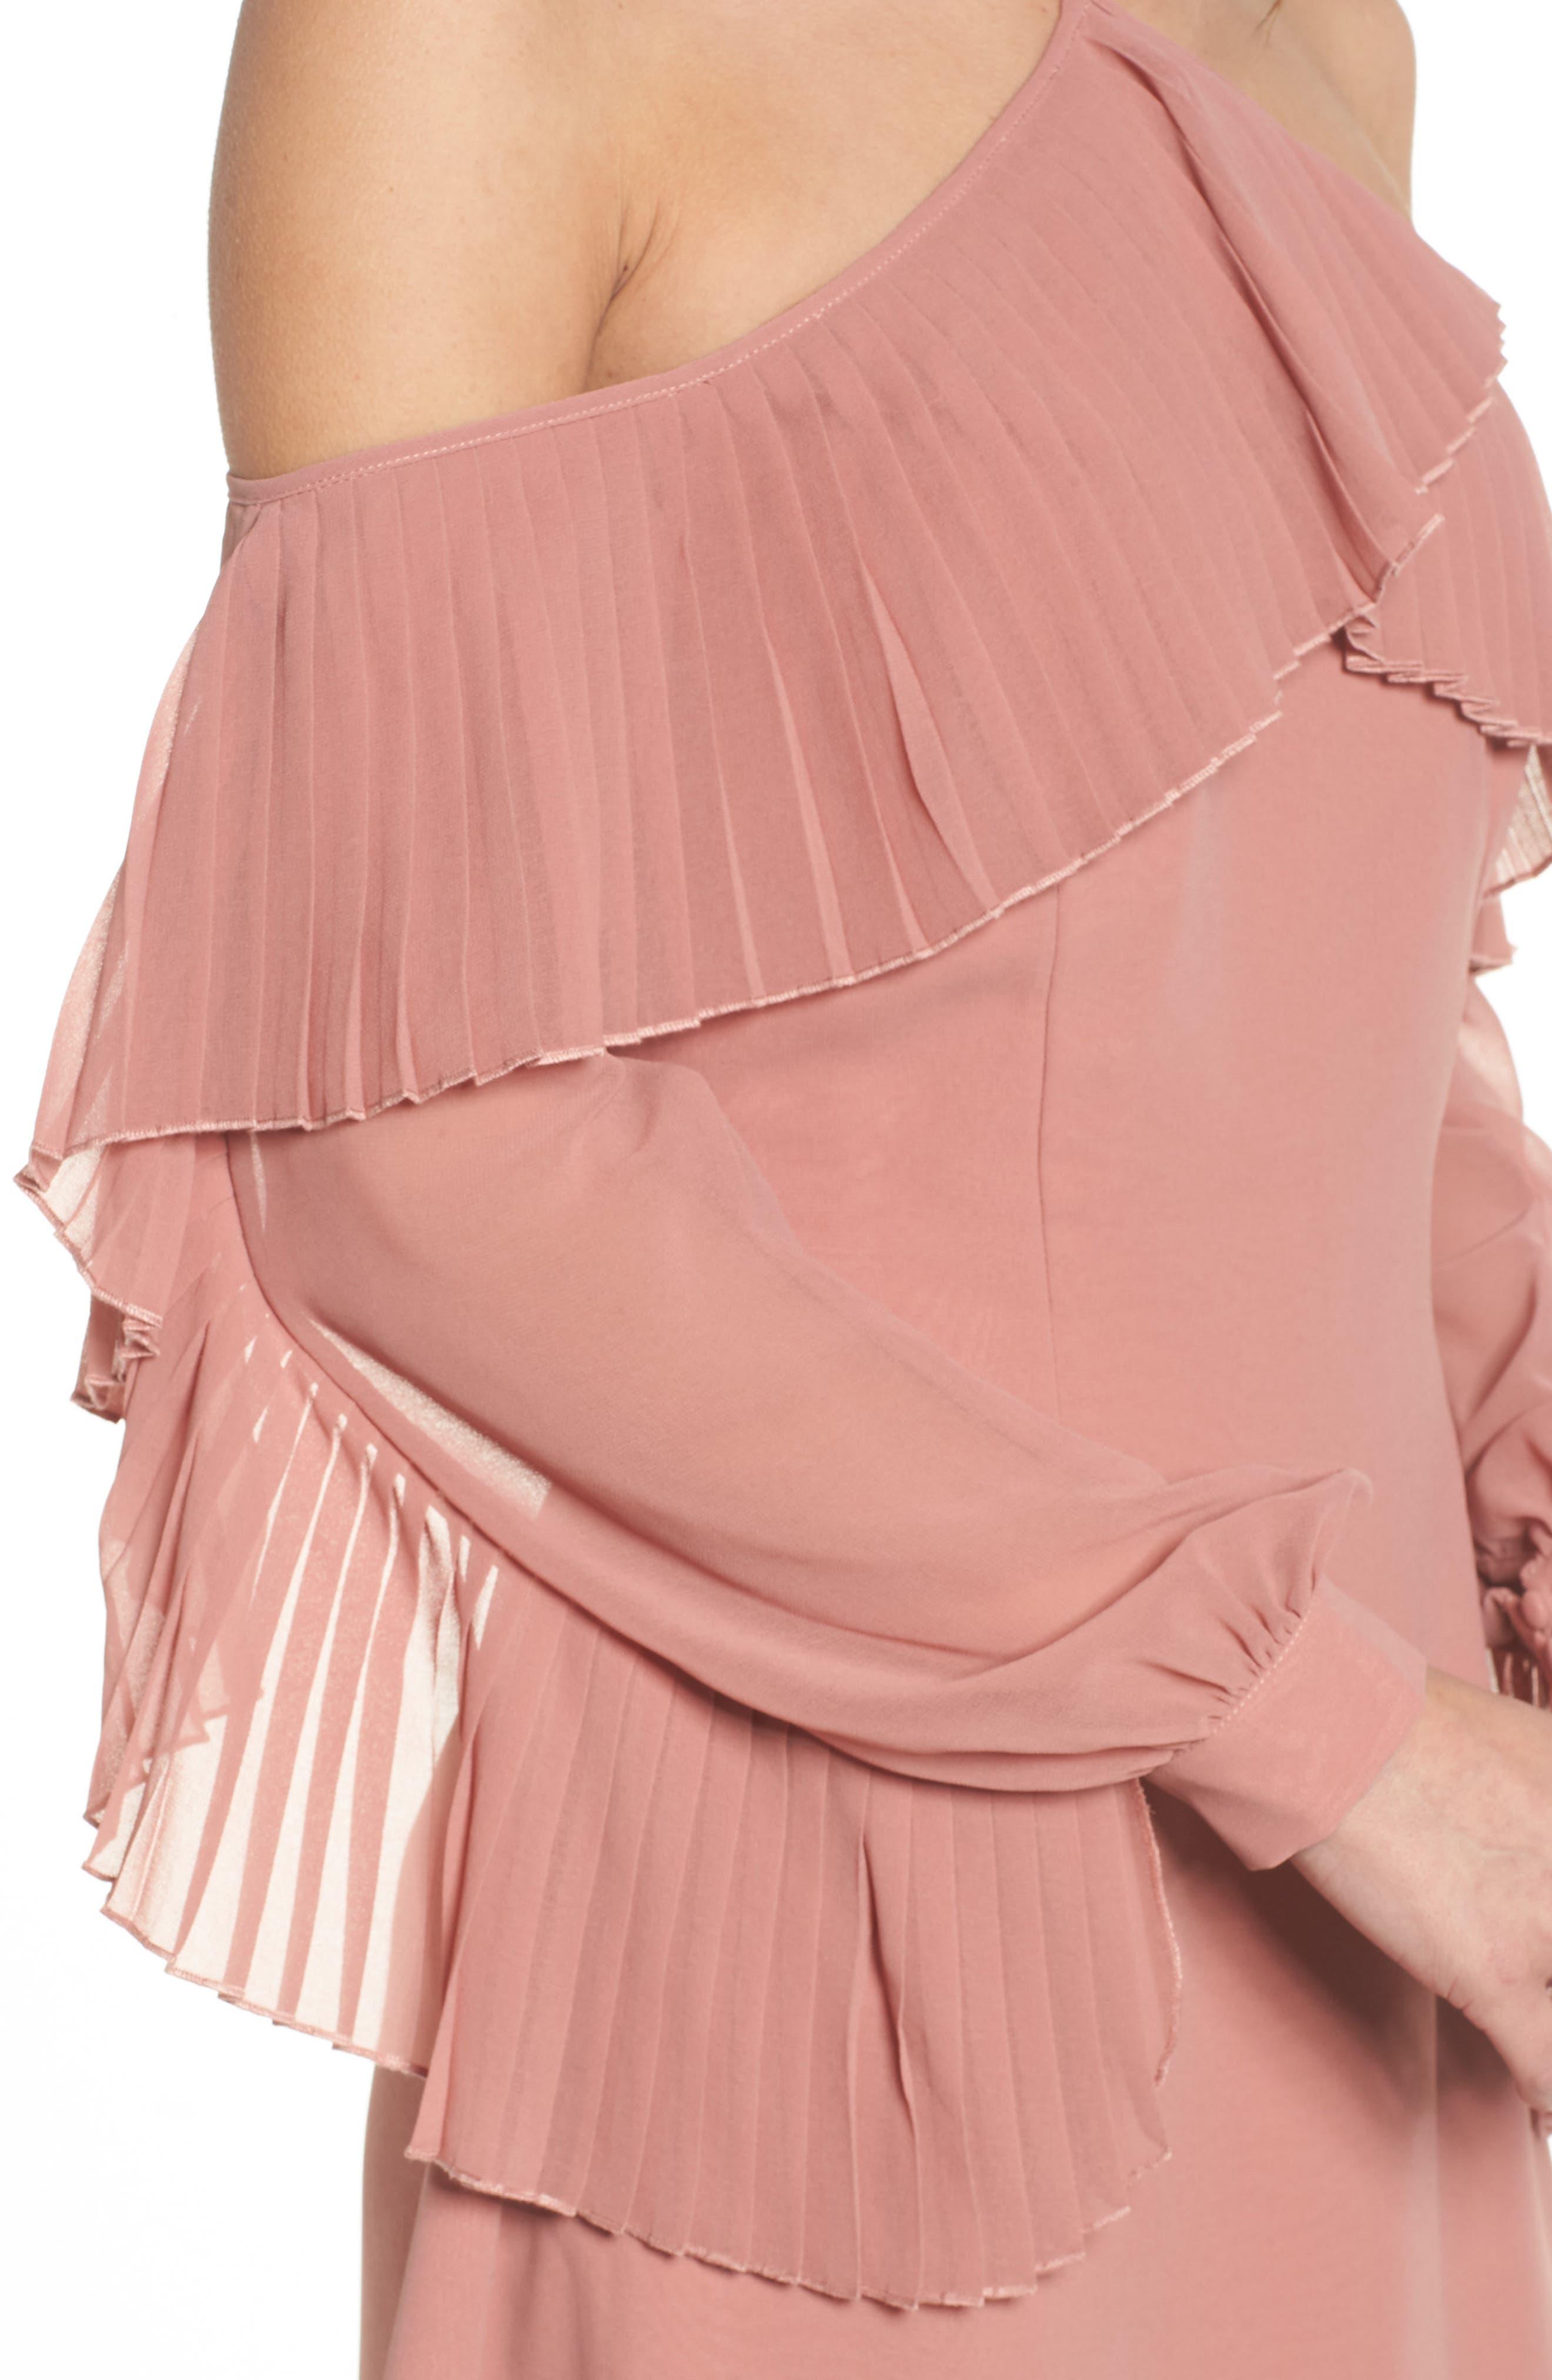 Last Dance Pleated Ruffle Minidress,                             Alternate thumbnail 4, color,